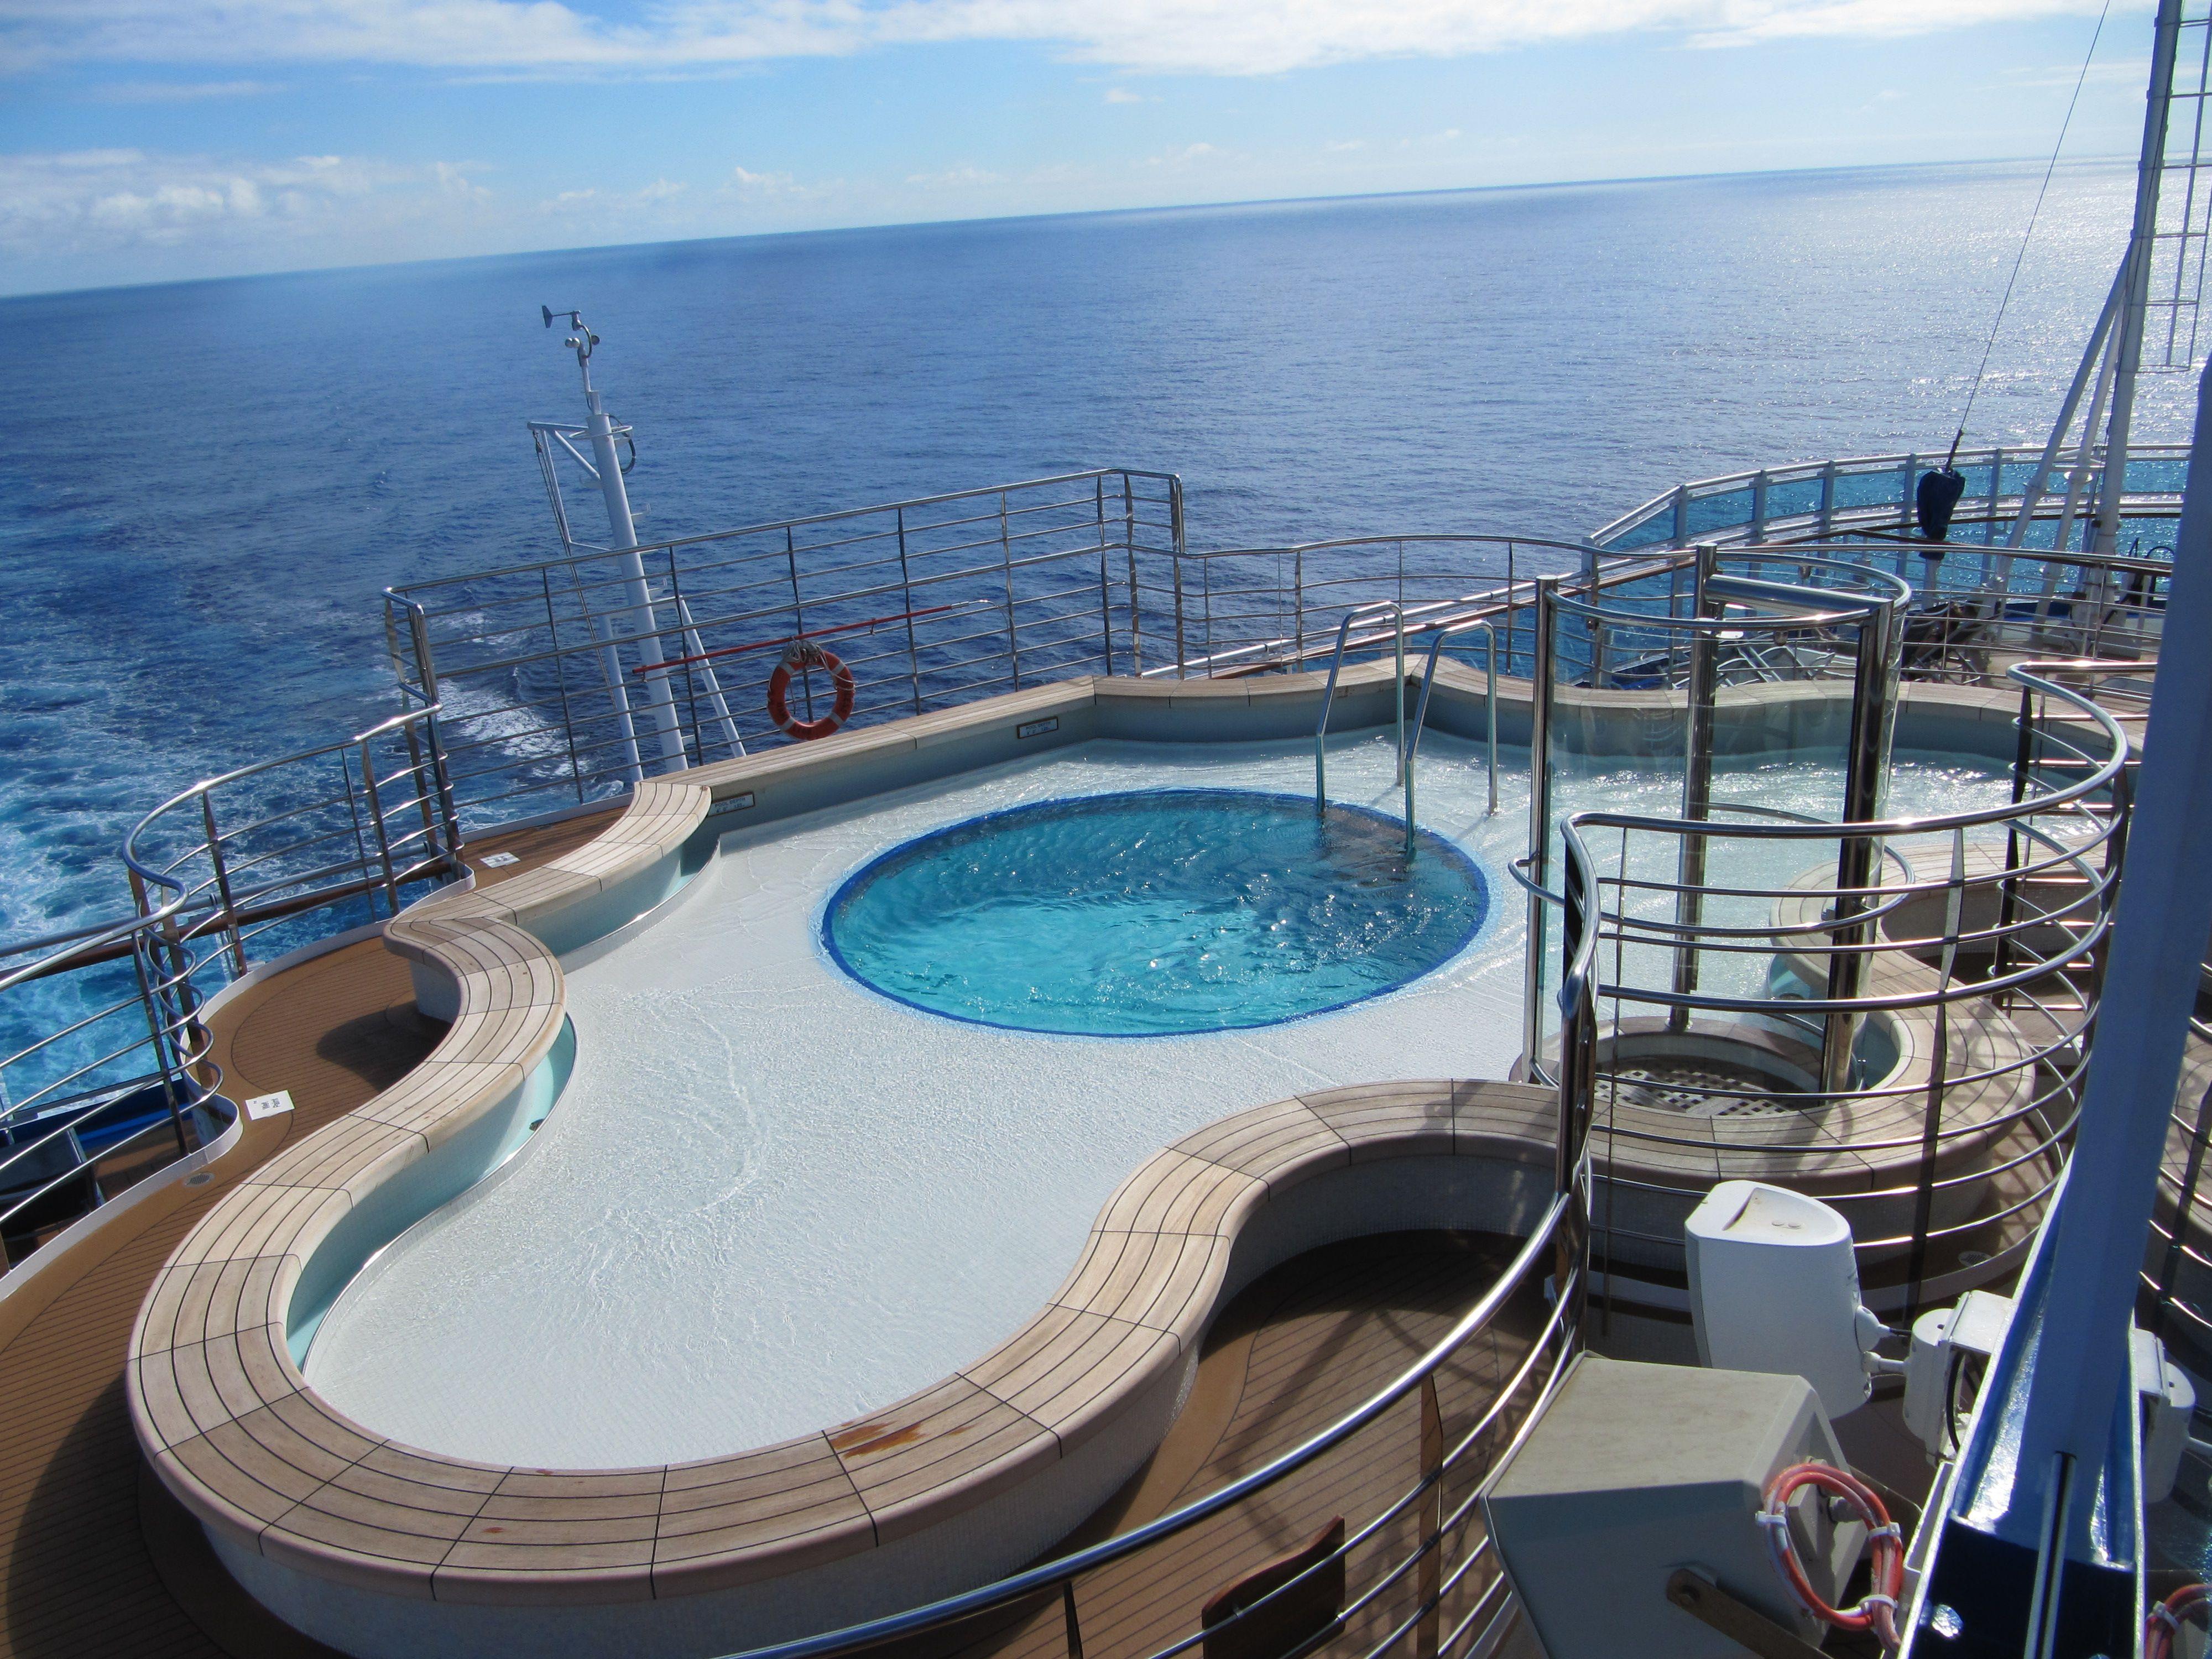 Aft Pool Regal Princess Cruise Ship Pinterest Princess - What is the aft of a cruise ship